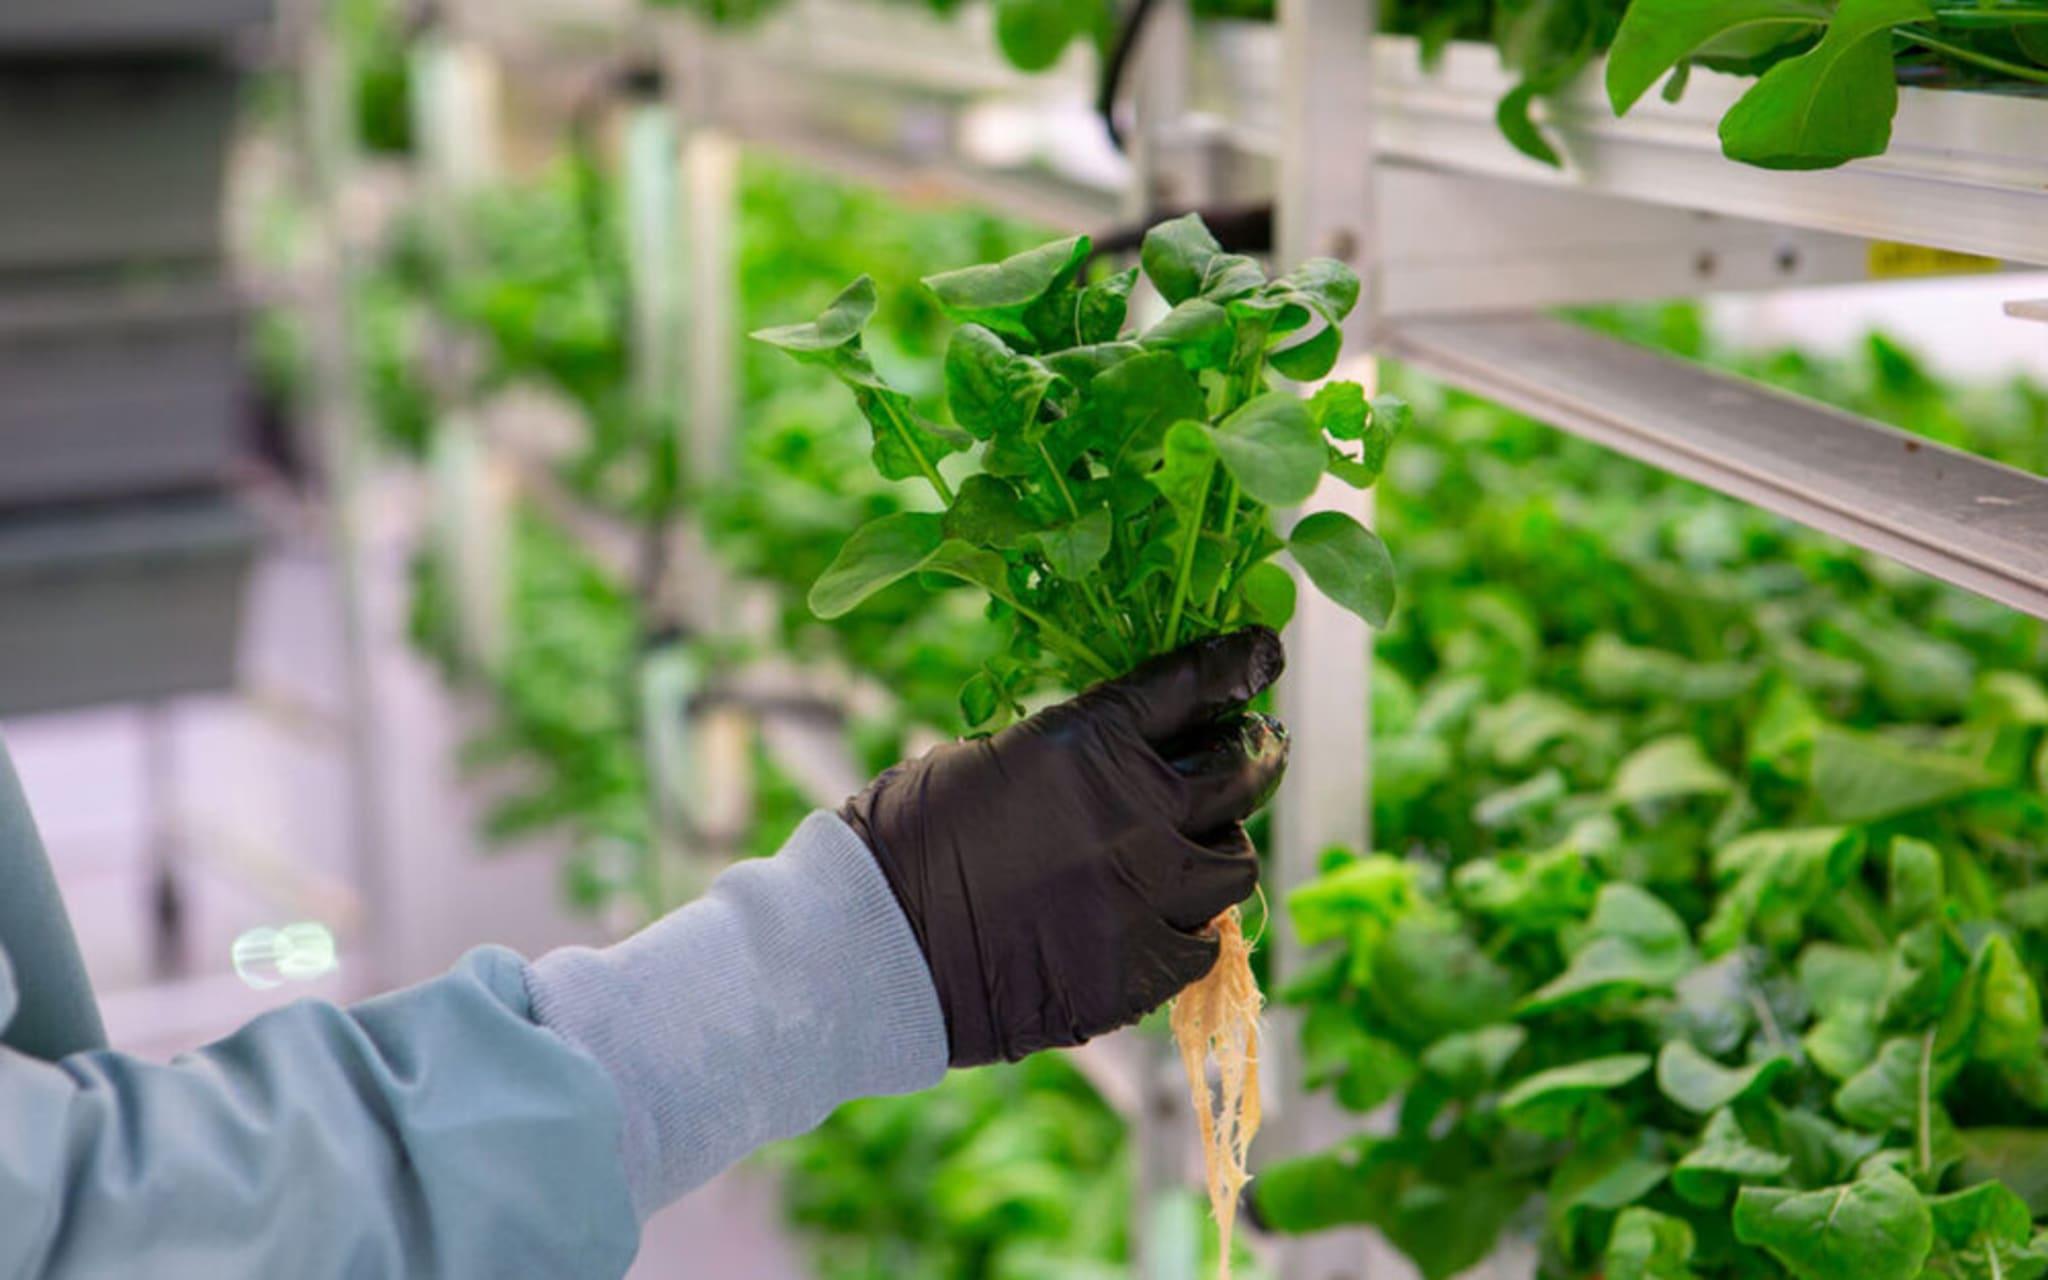 Harare - Learn about Hydroponics farming and explore Pomona Market